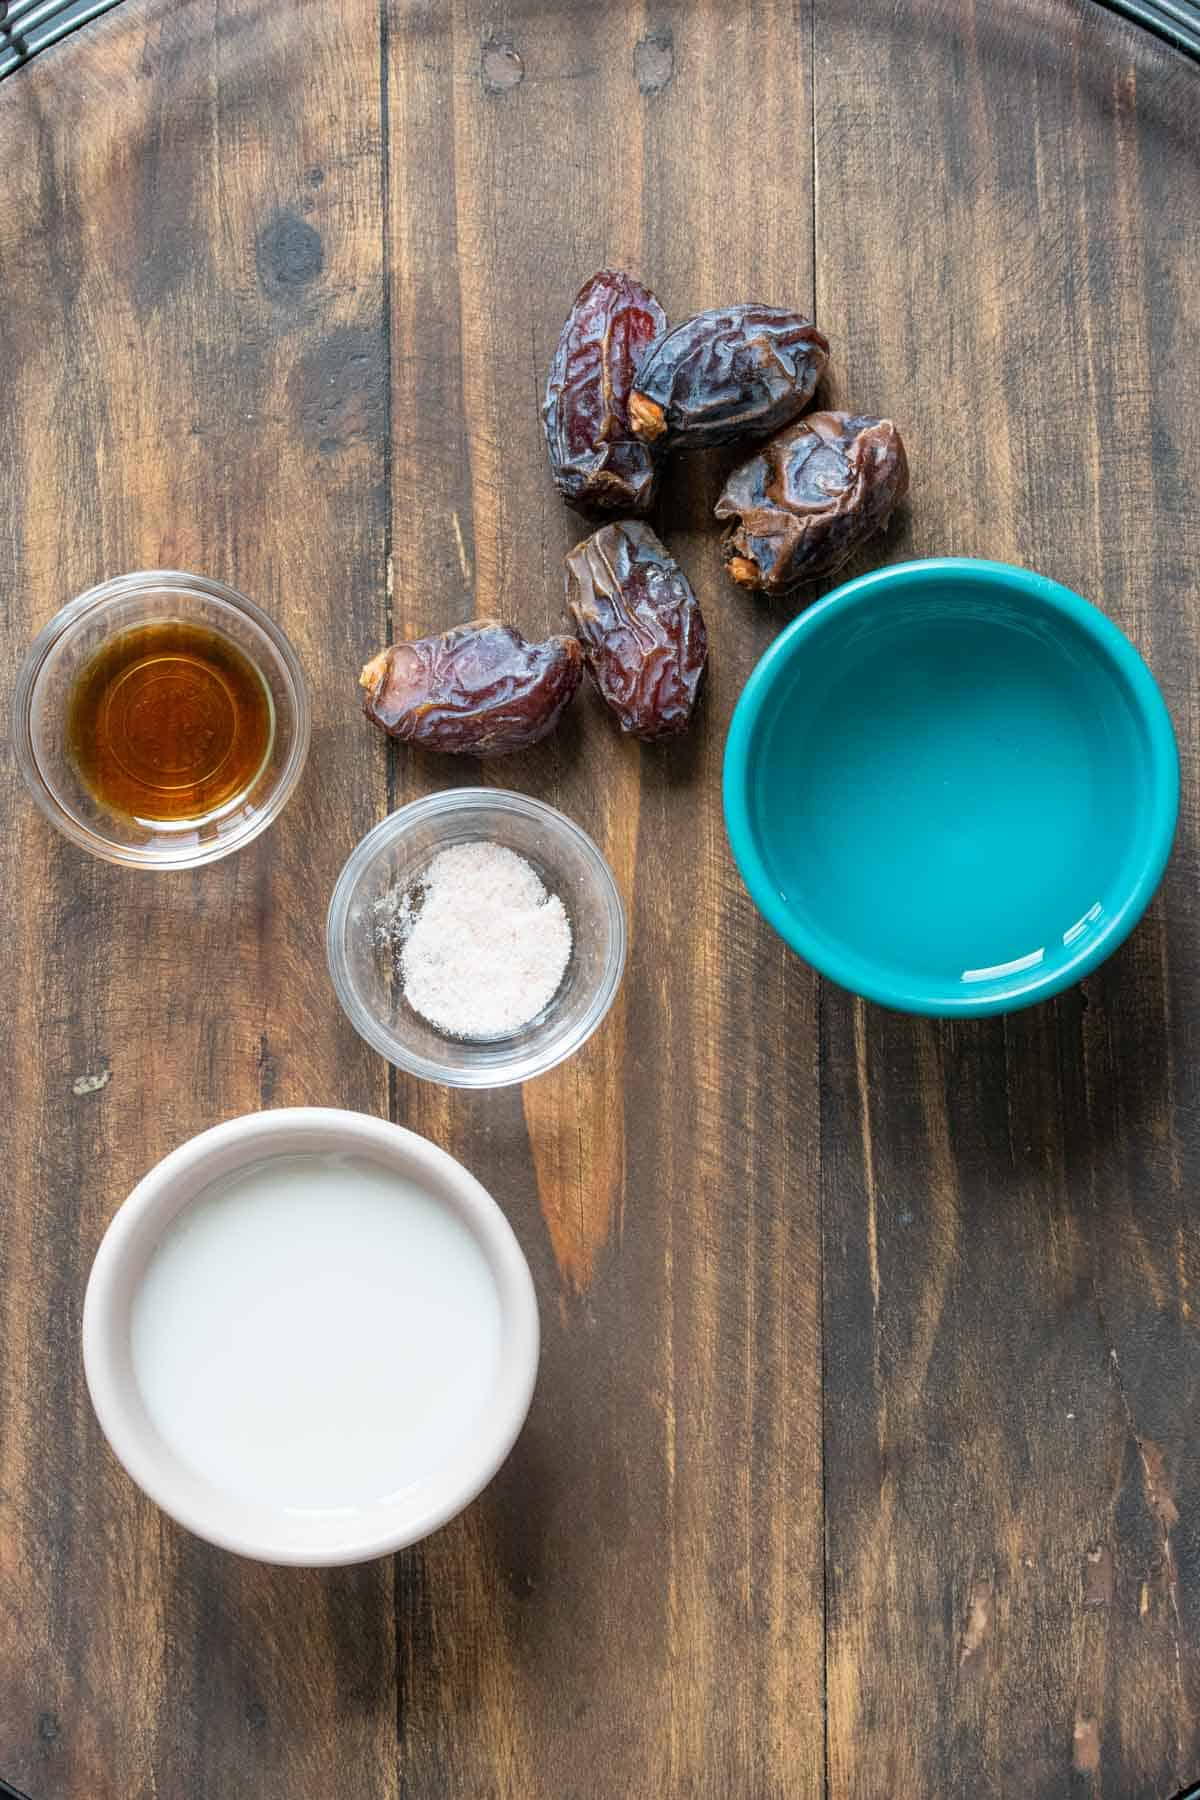 Dates, water, milk, salt and vanilla on a wooden table